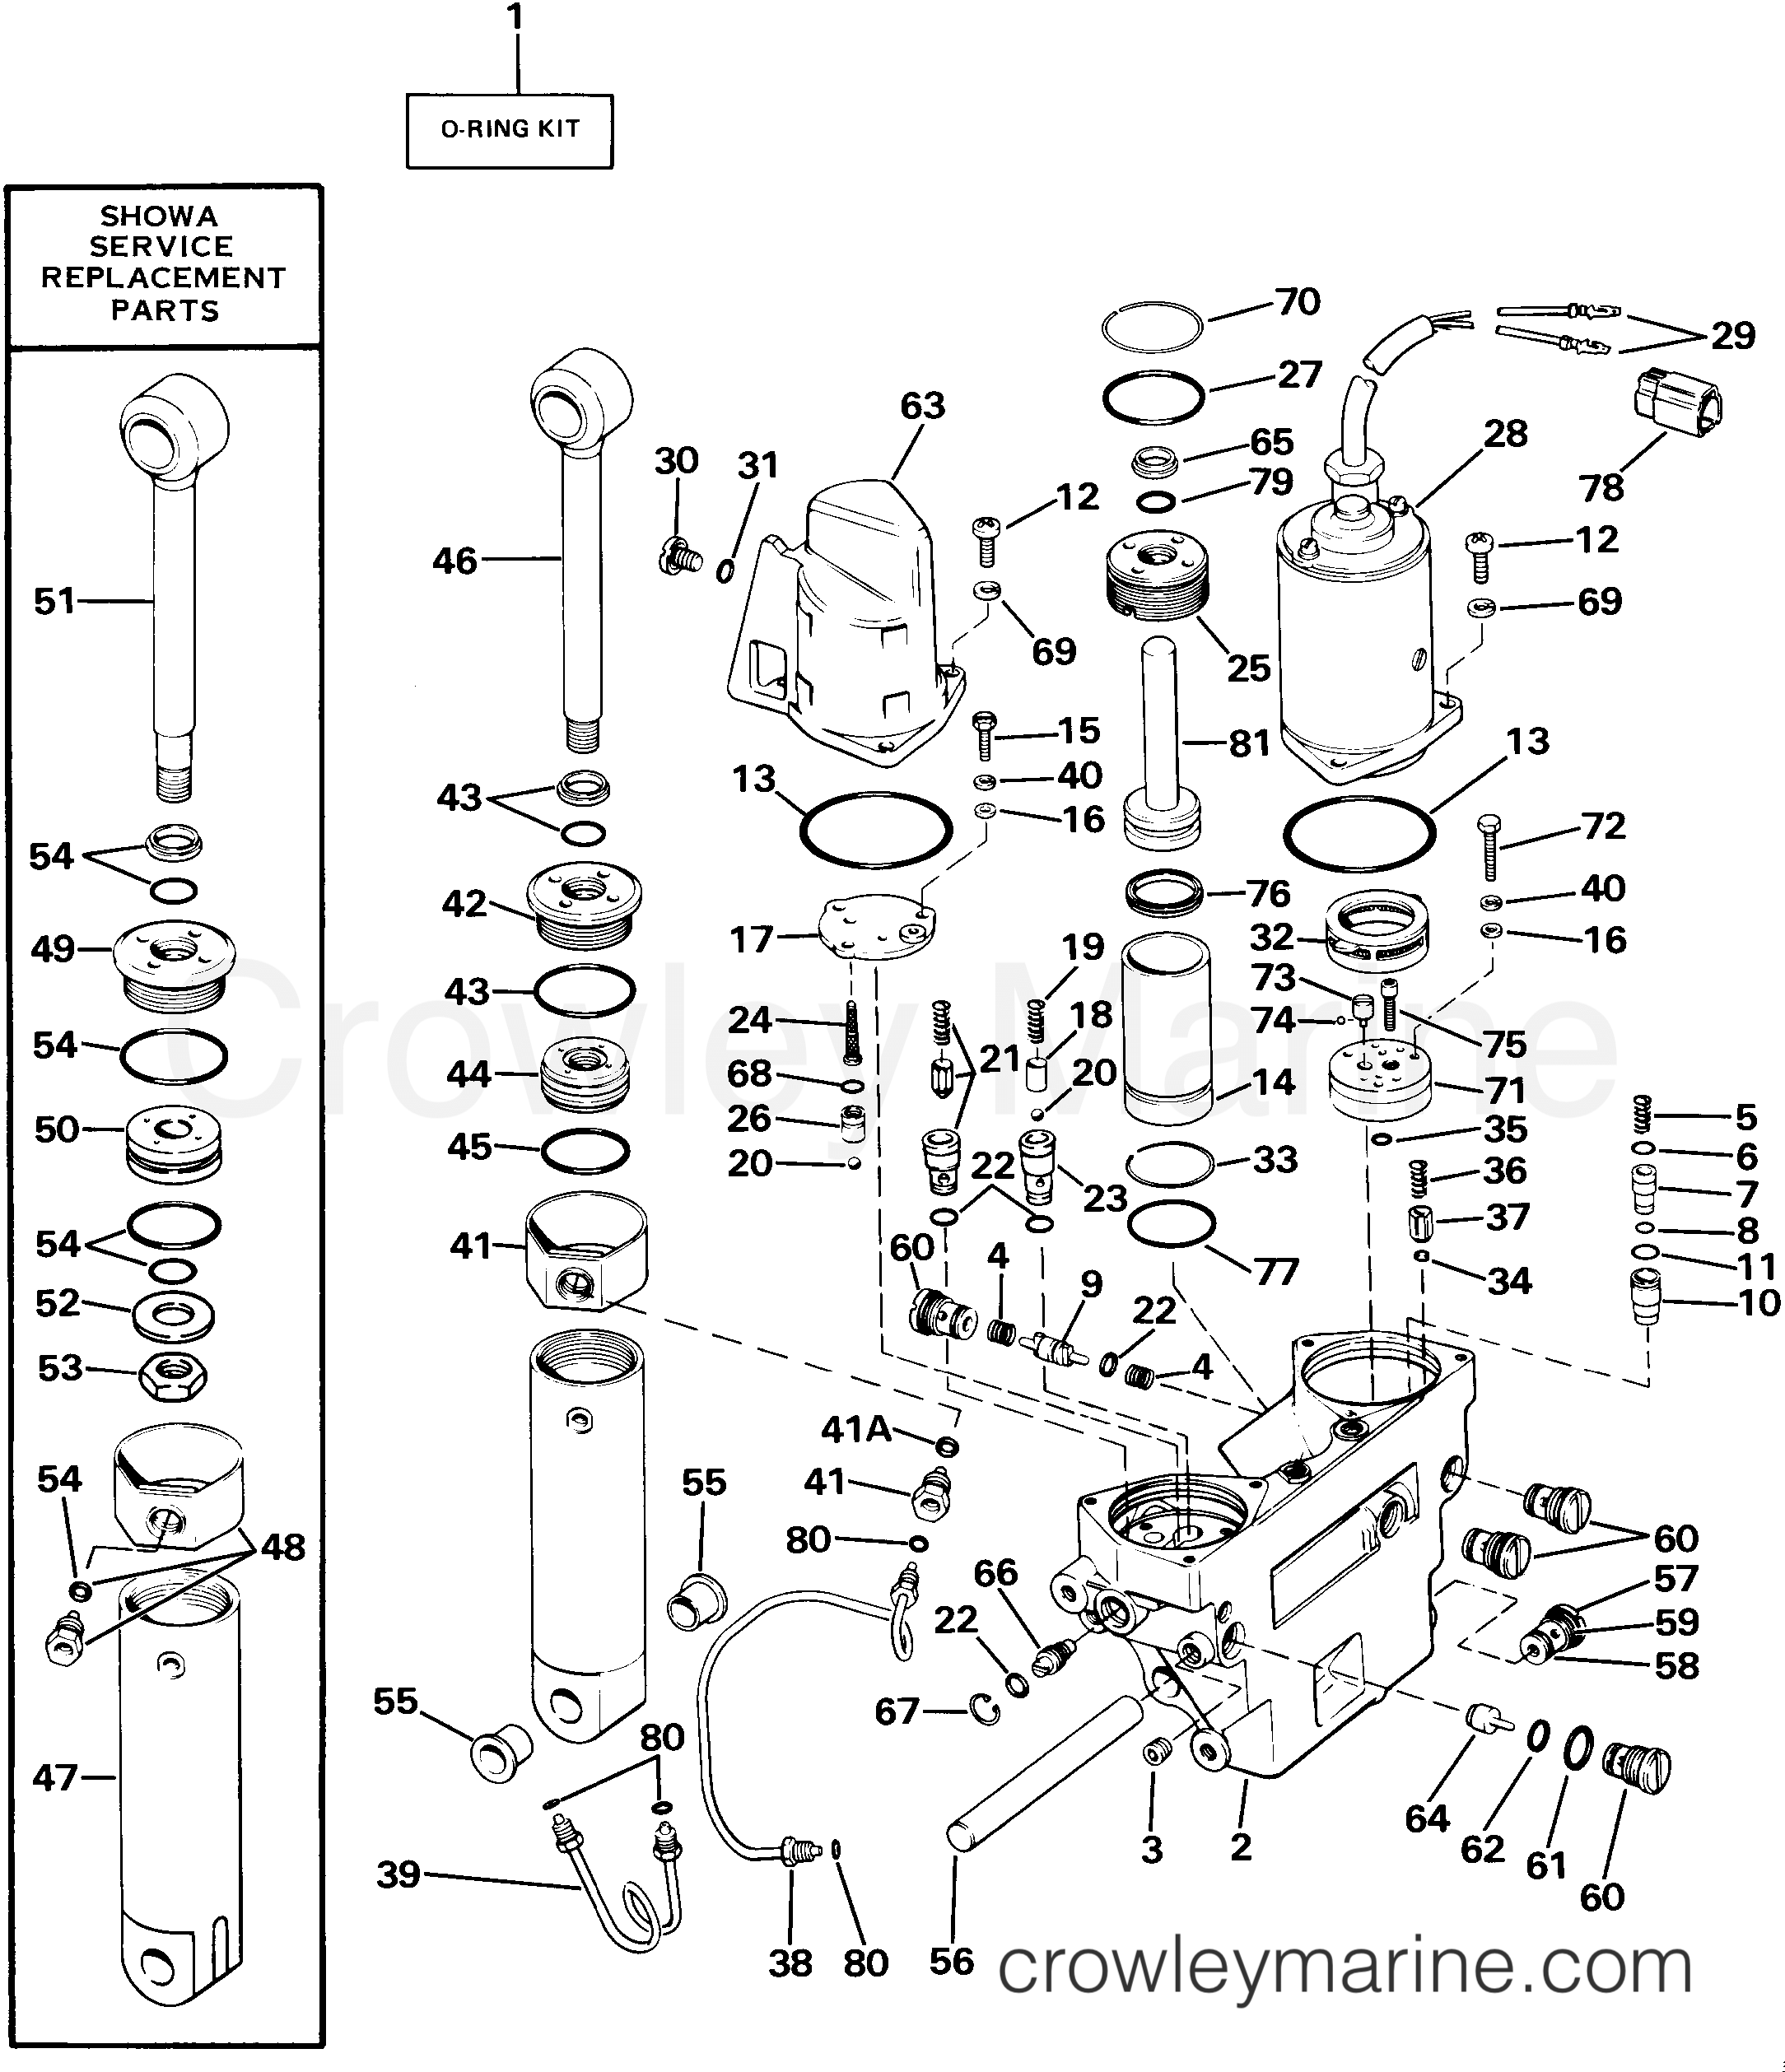 Power Trim Tilt Hydraulic Assembly 1985 Evinrude